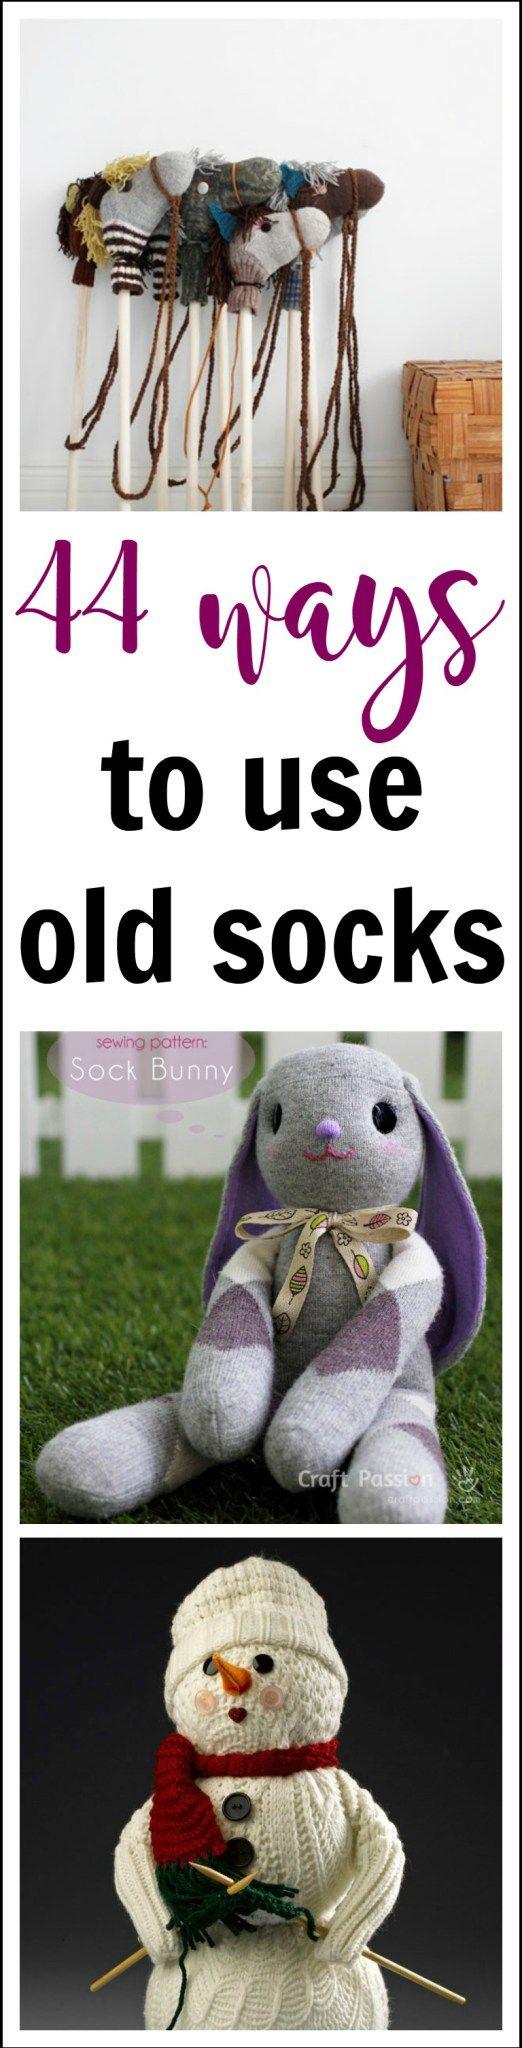 44 ways to use old socks - Domesblissity